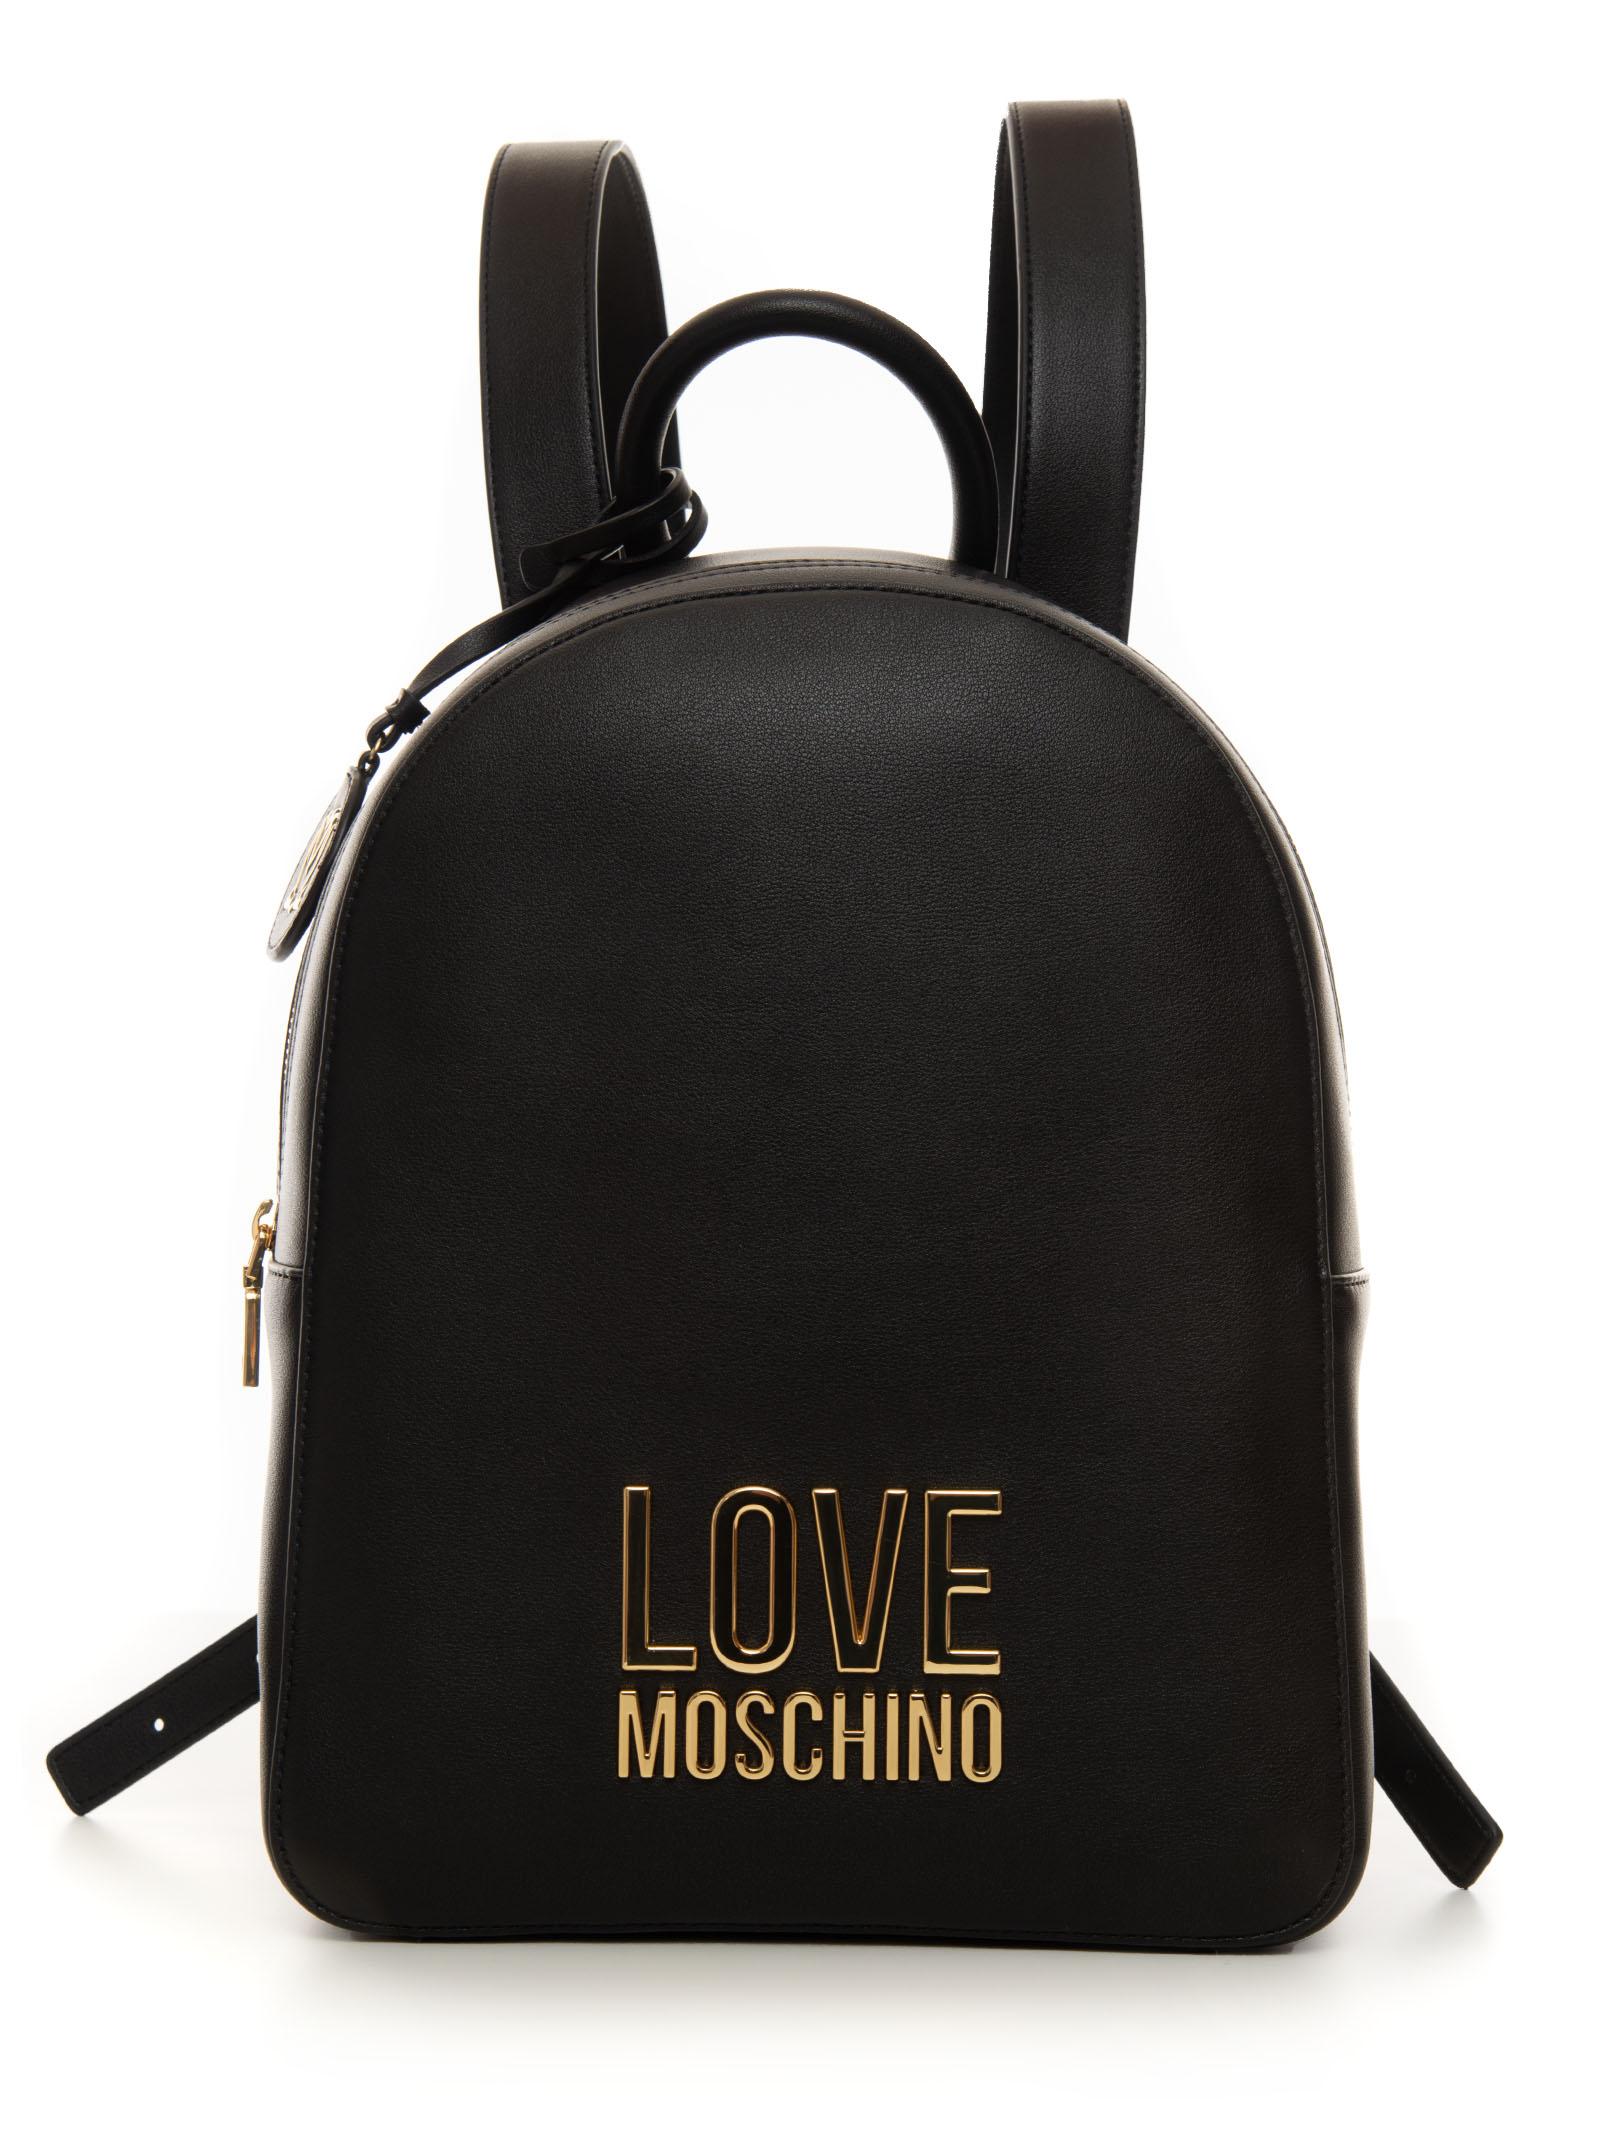 Love Moschino BACKPACK BLACK POLYURETHANE WOMAN